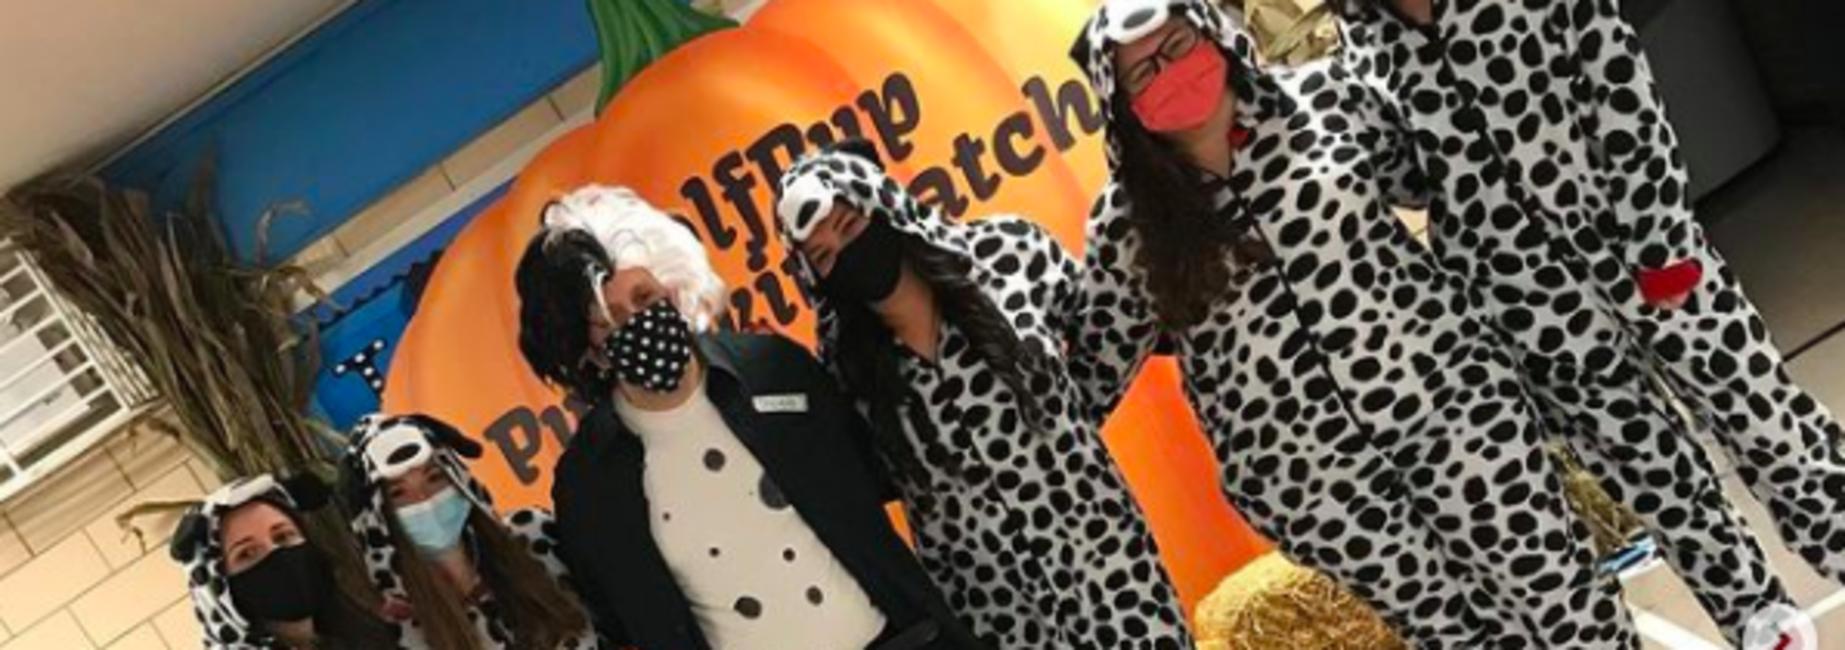 Teachers dressed for halloween